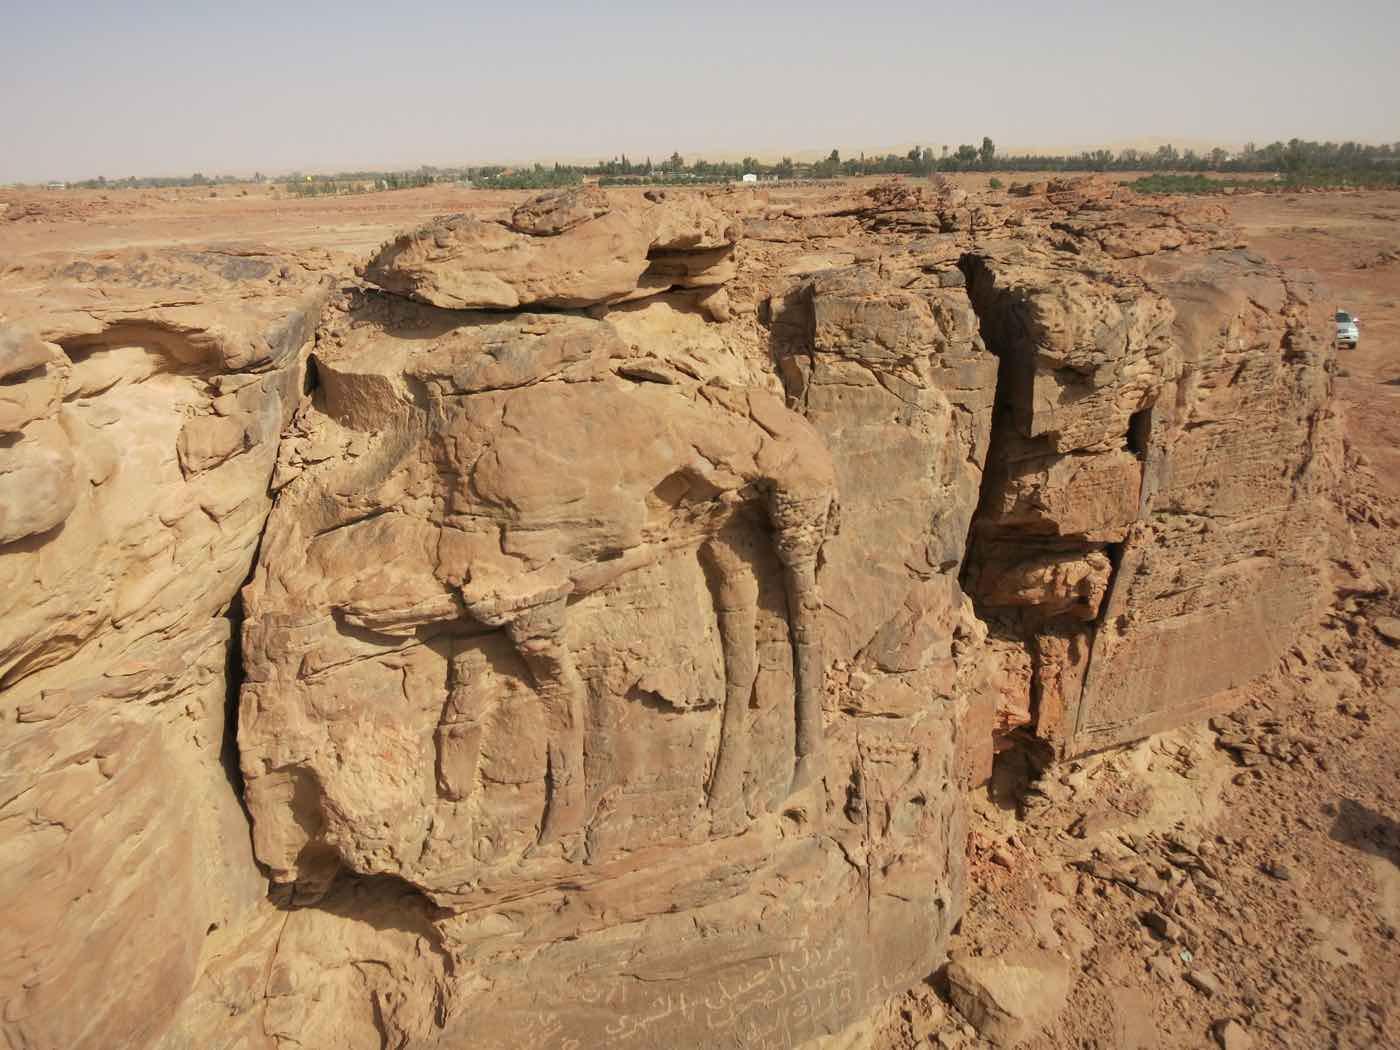 Ancient Rock Carving found in remote Saudi Arabia